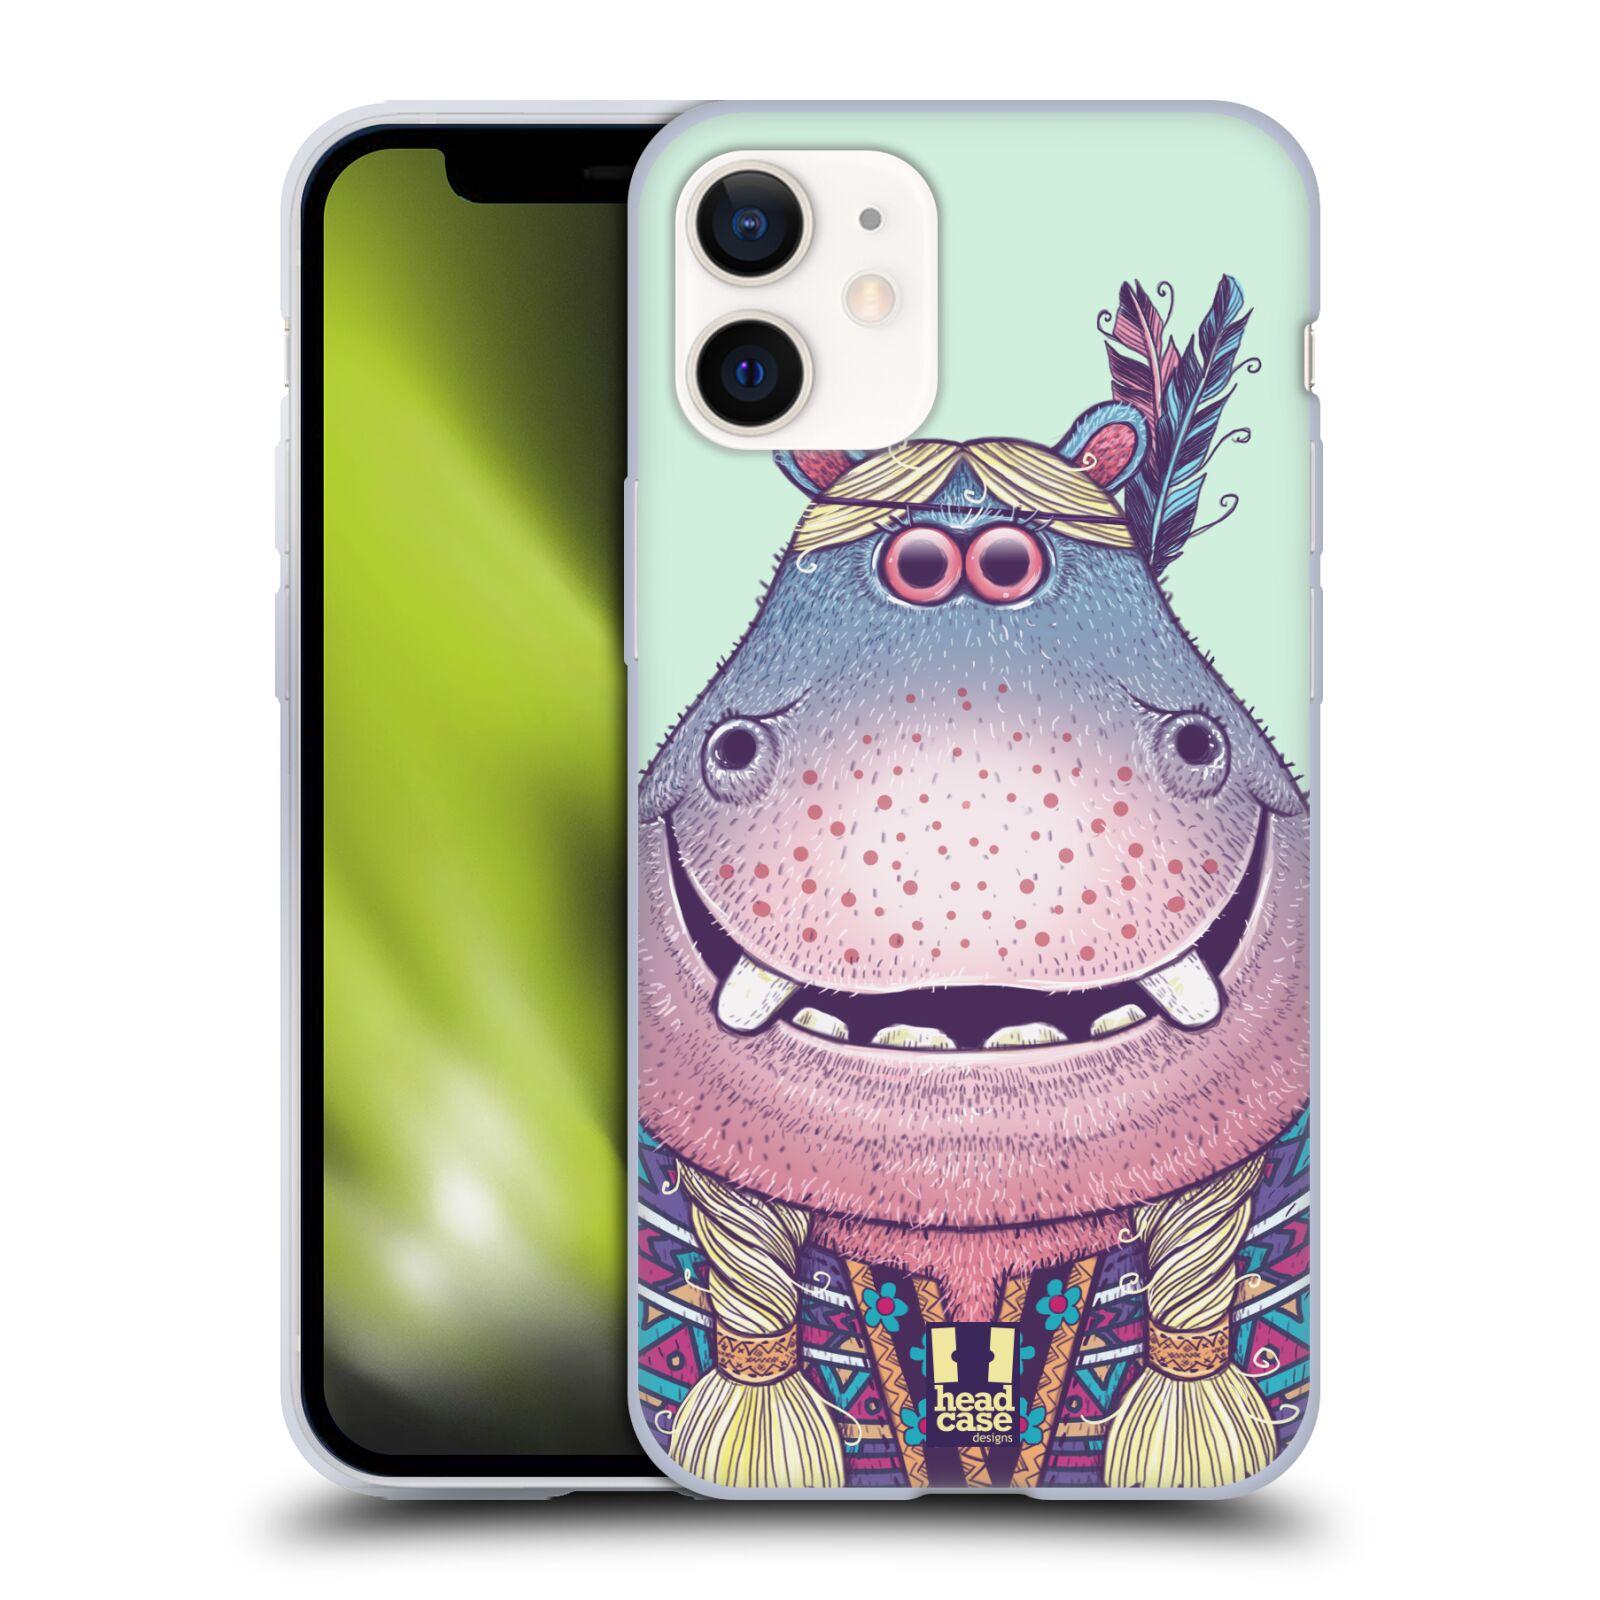 Plastový obal na mobil Apple Iphone 12 MINI vzor Kreslená zvířátka hroch